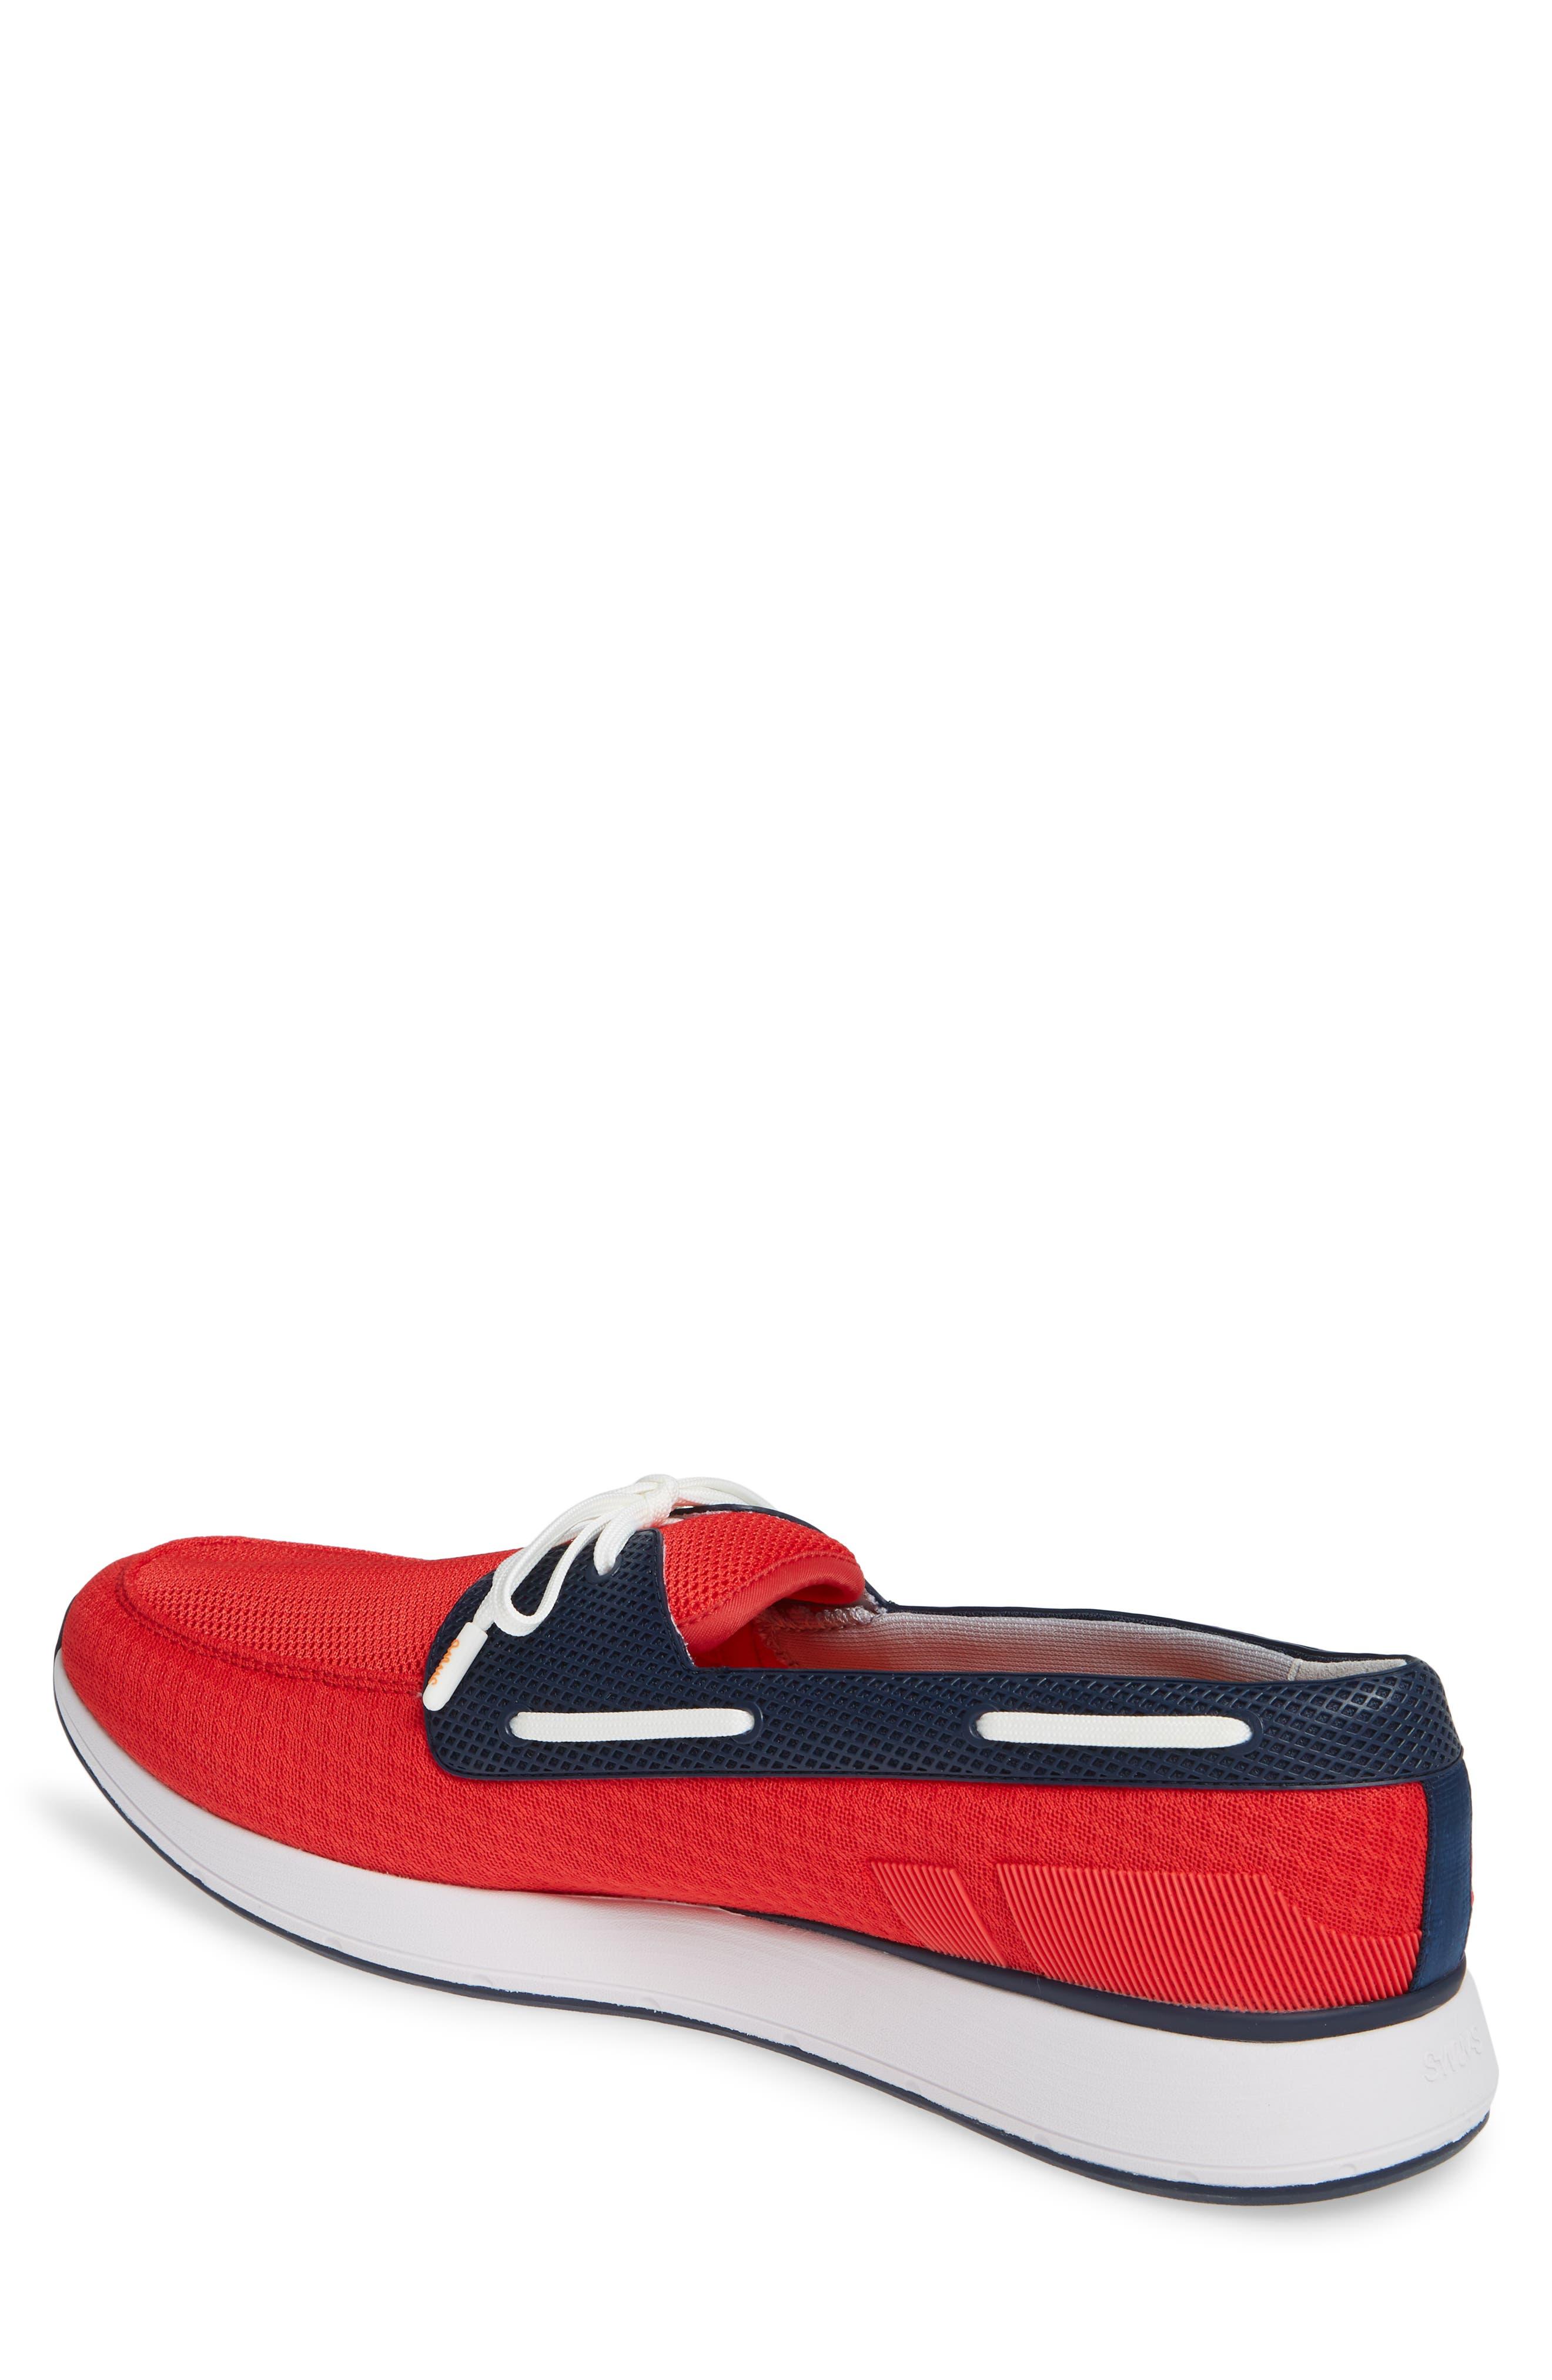 429f2d9b4ed Swims Shoes